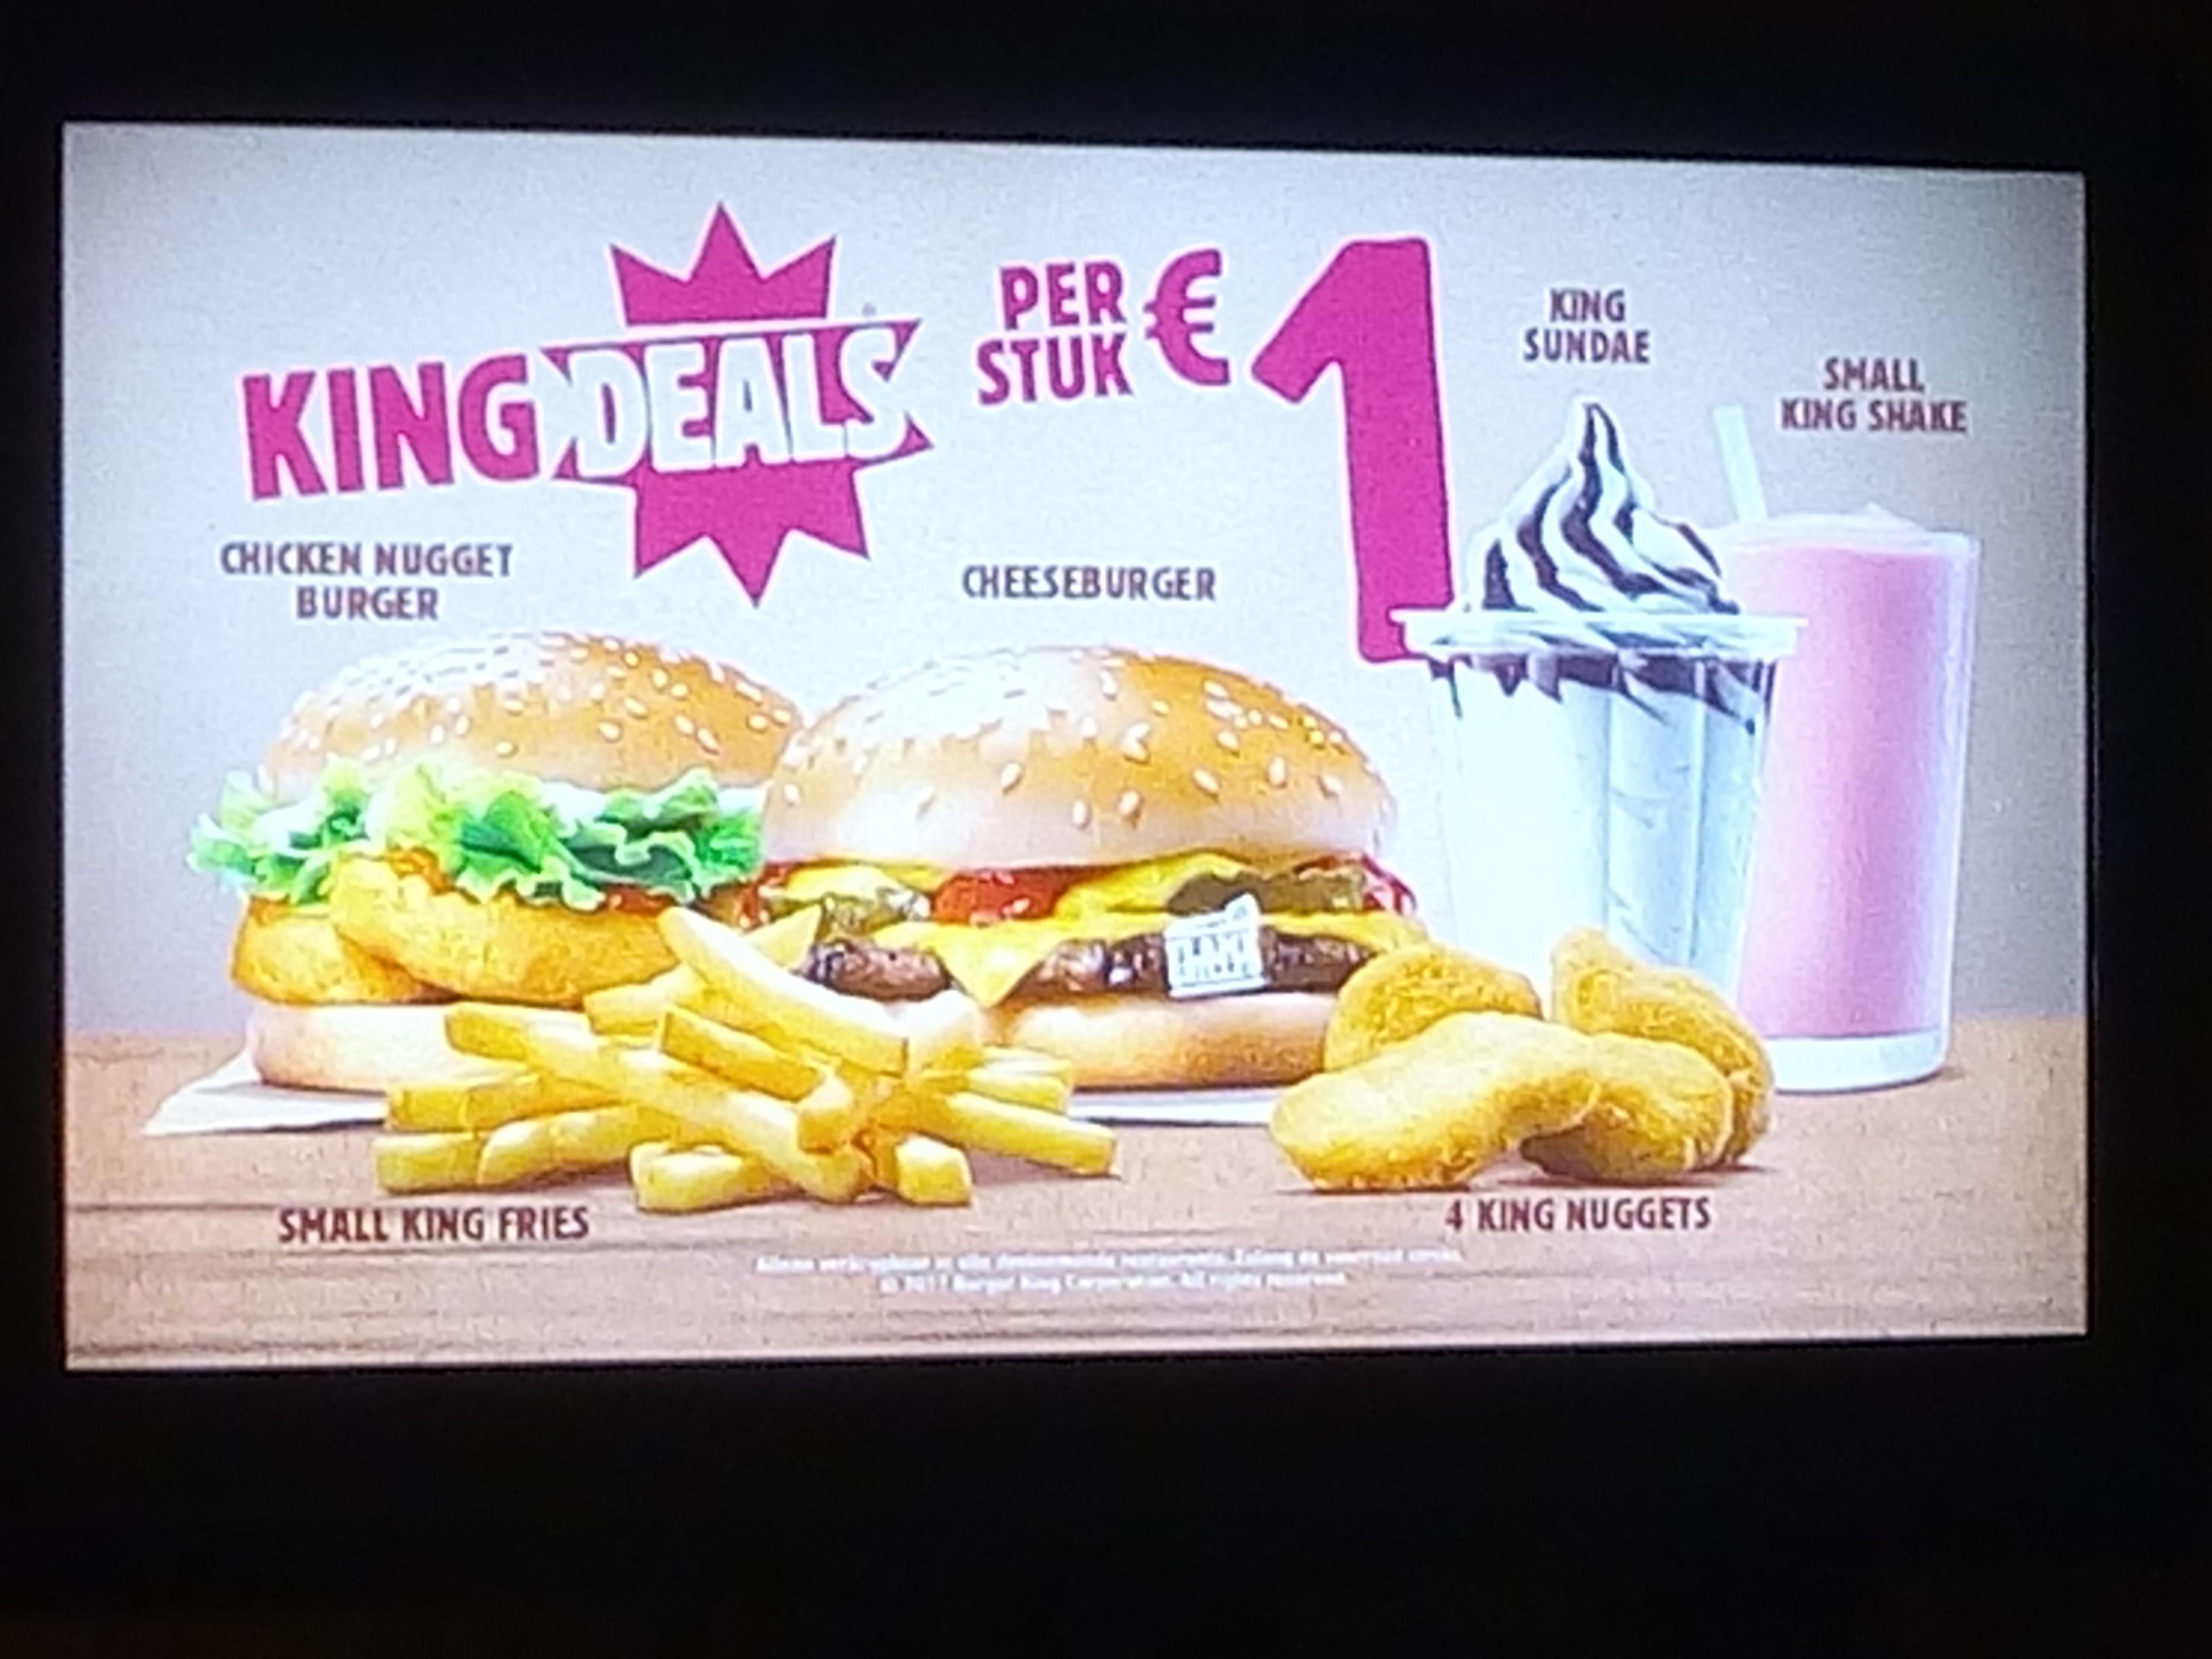 €1 Kingdeals Burgerking!